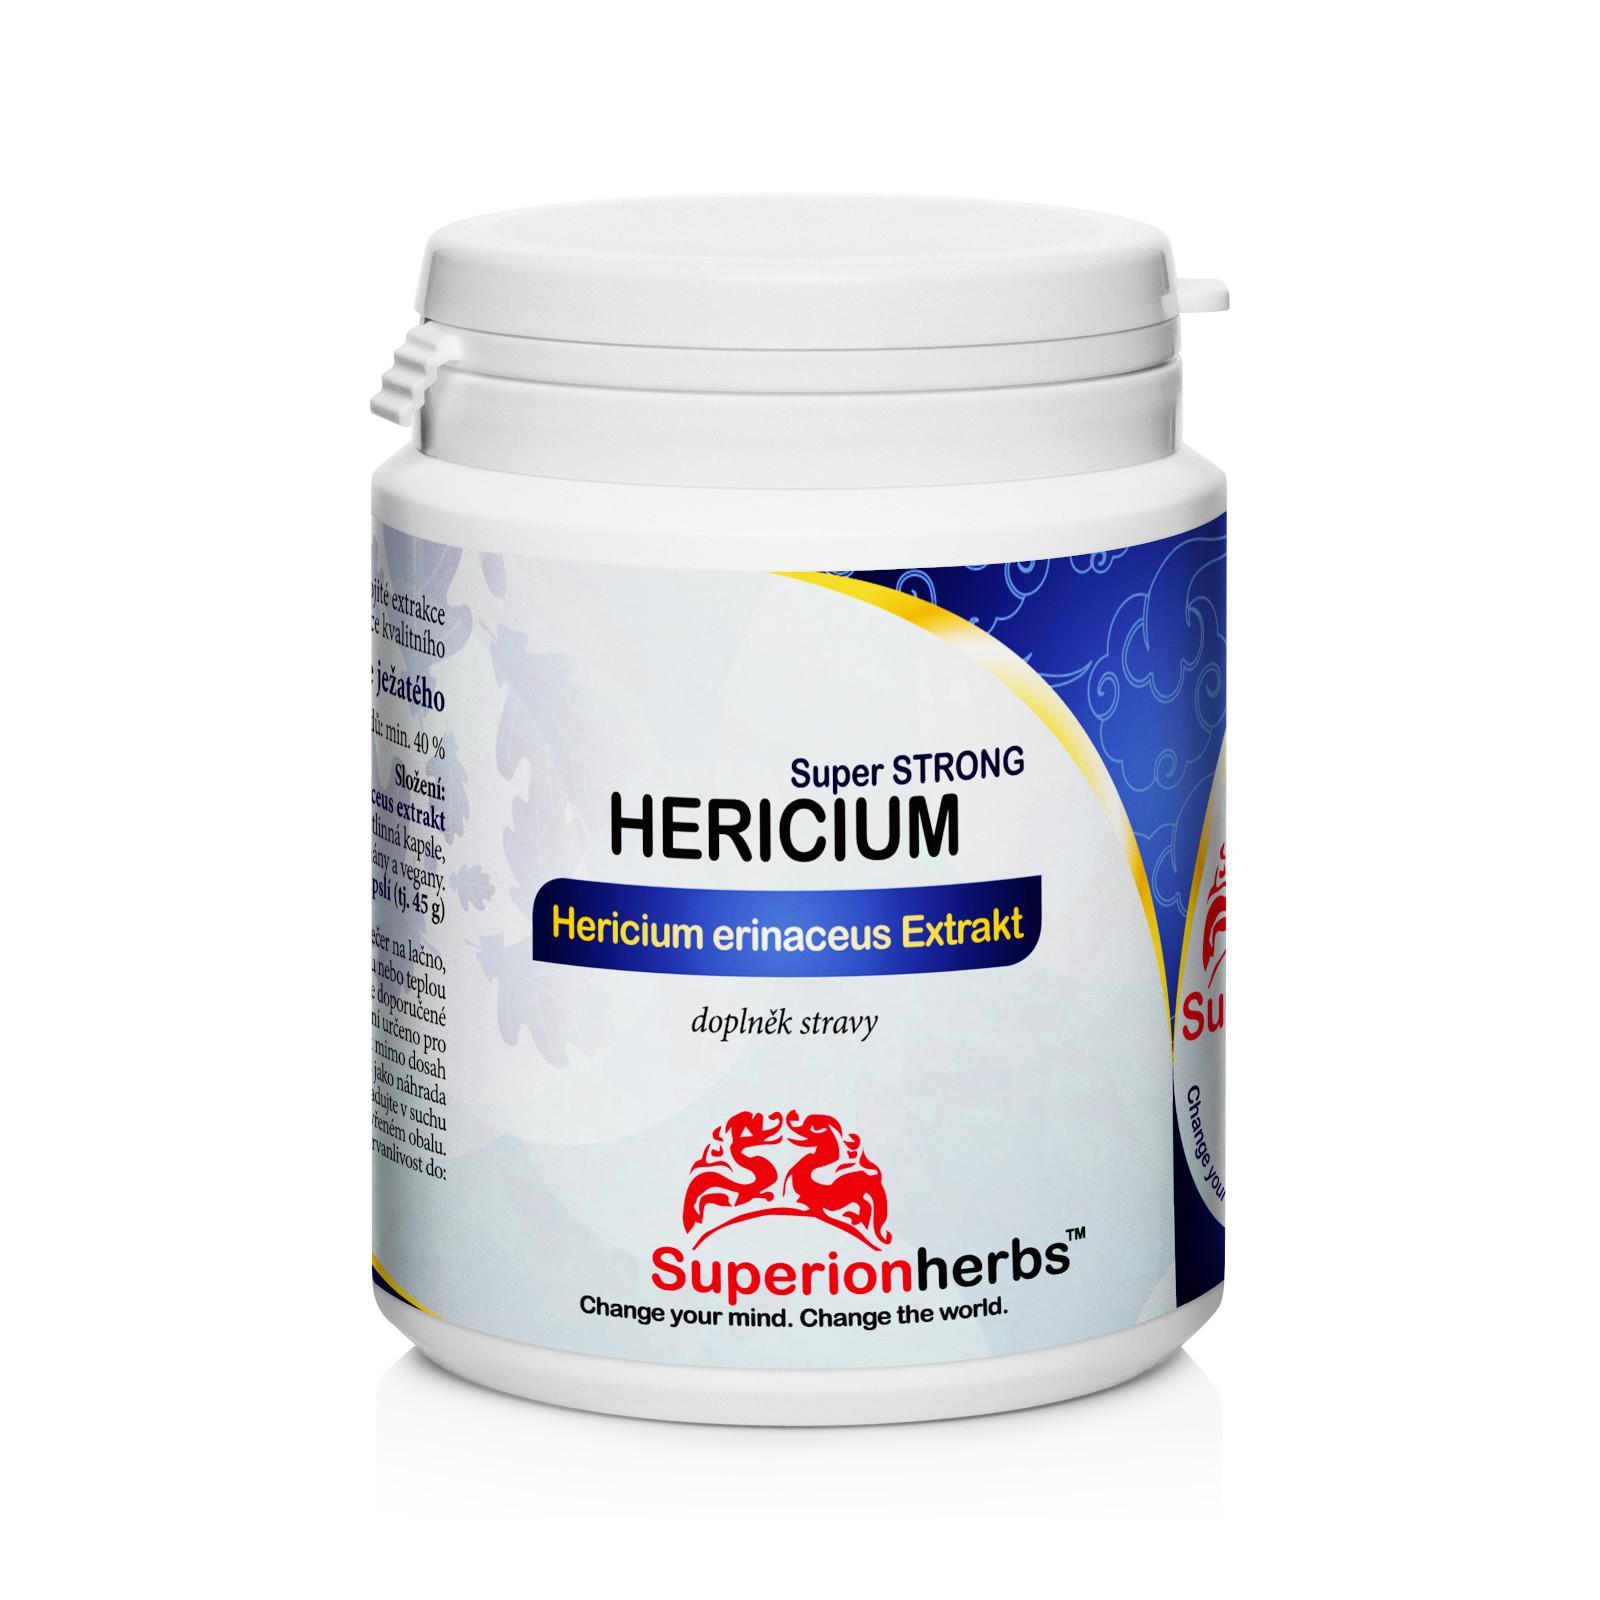 Superionherbs Hericium Lví hříva, kapsle 90 ks